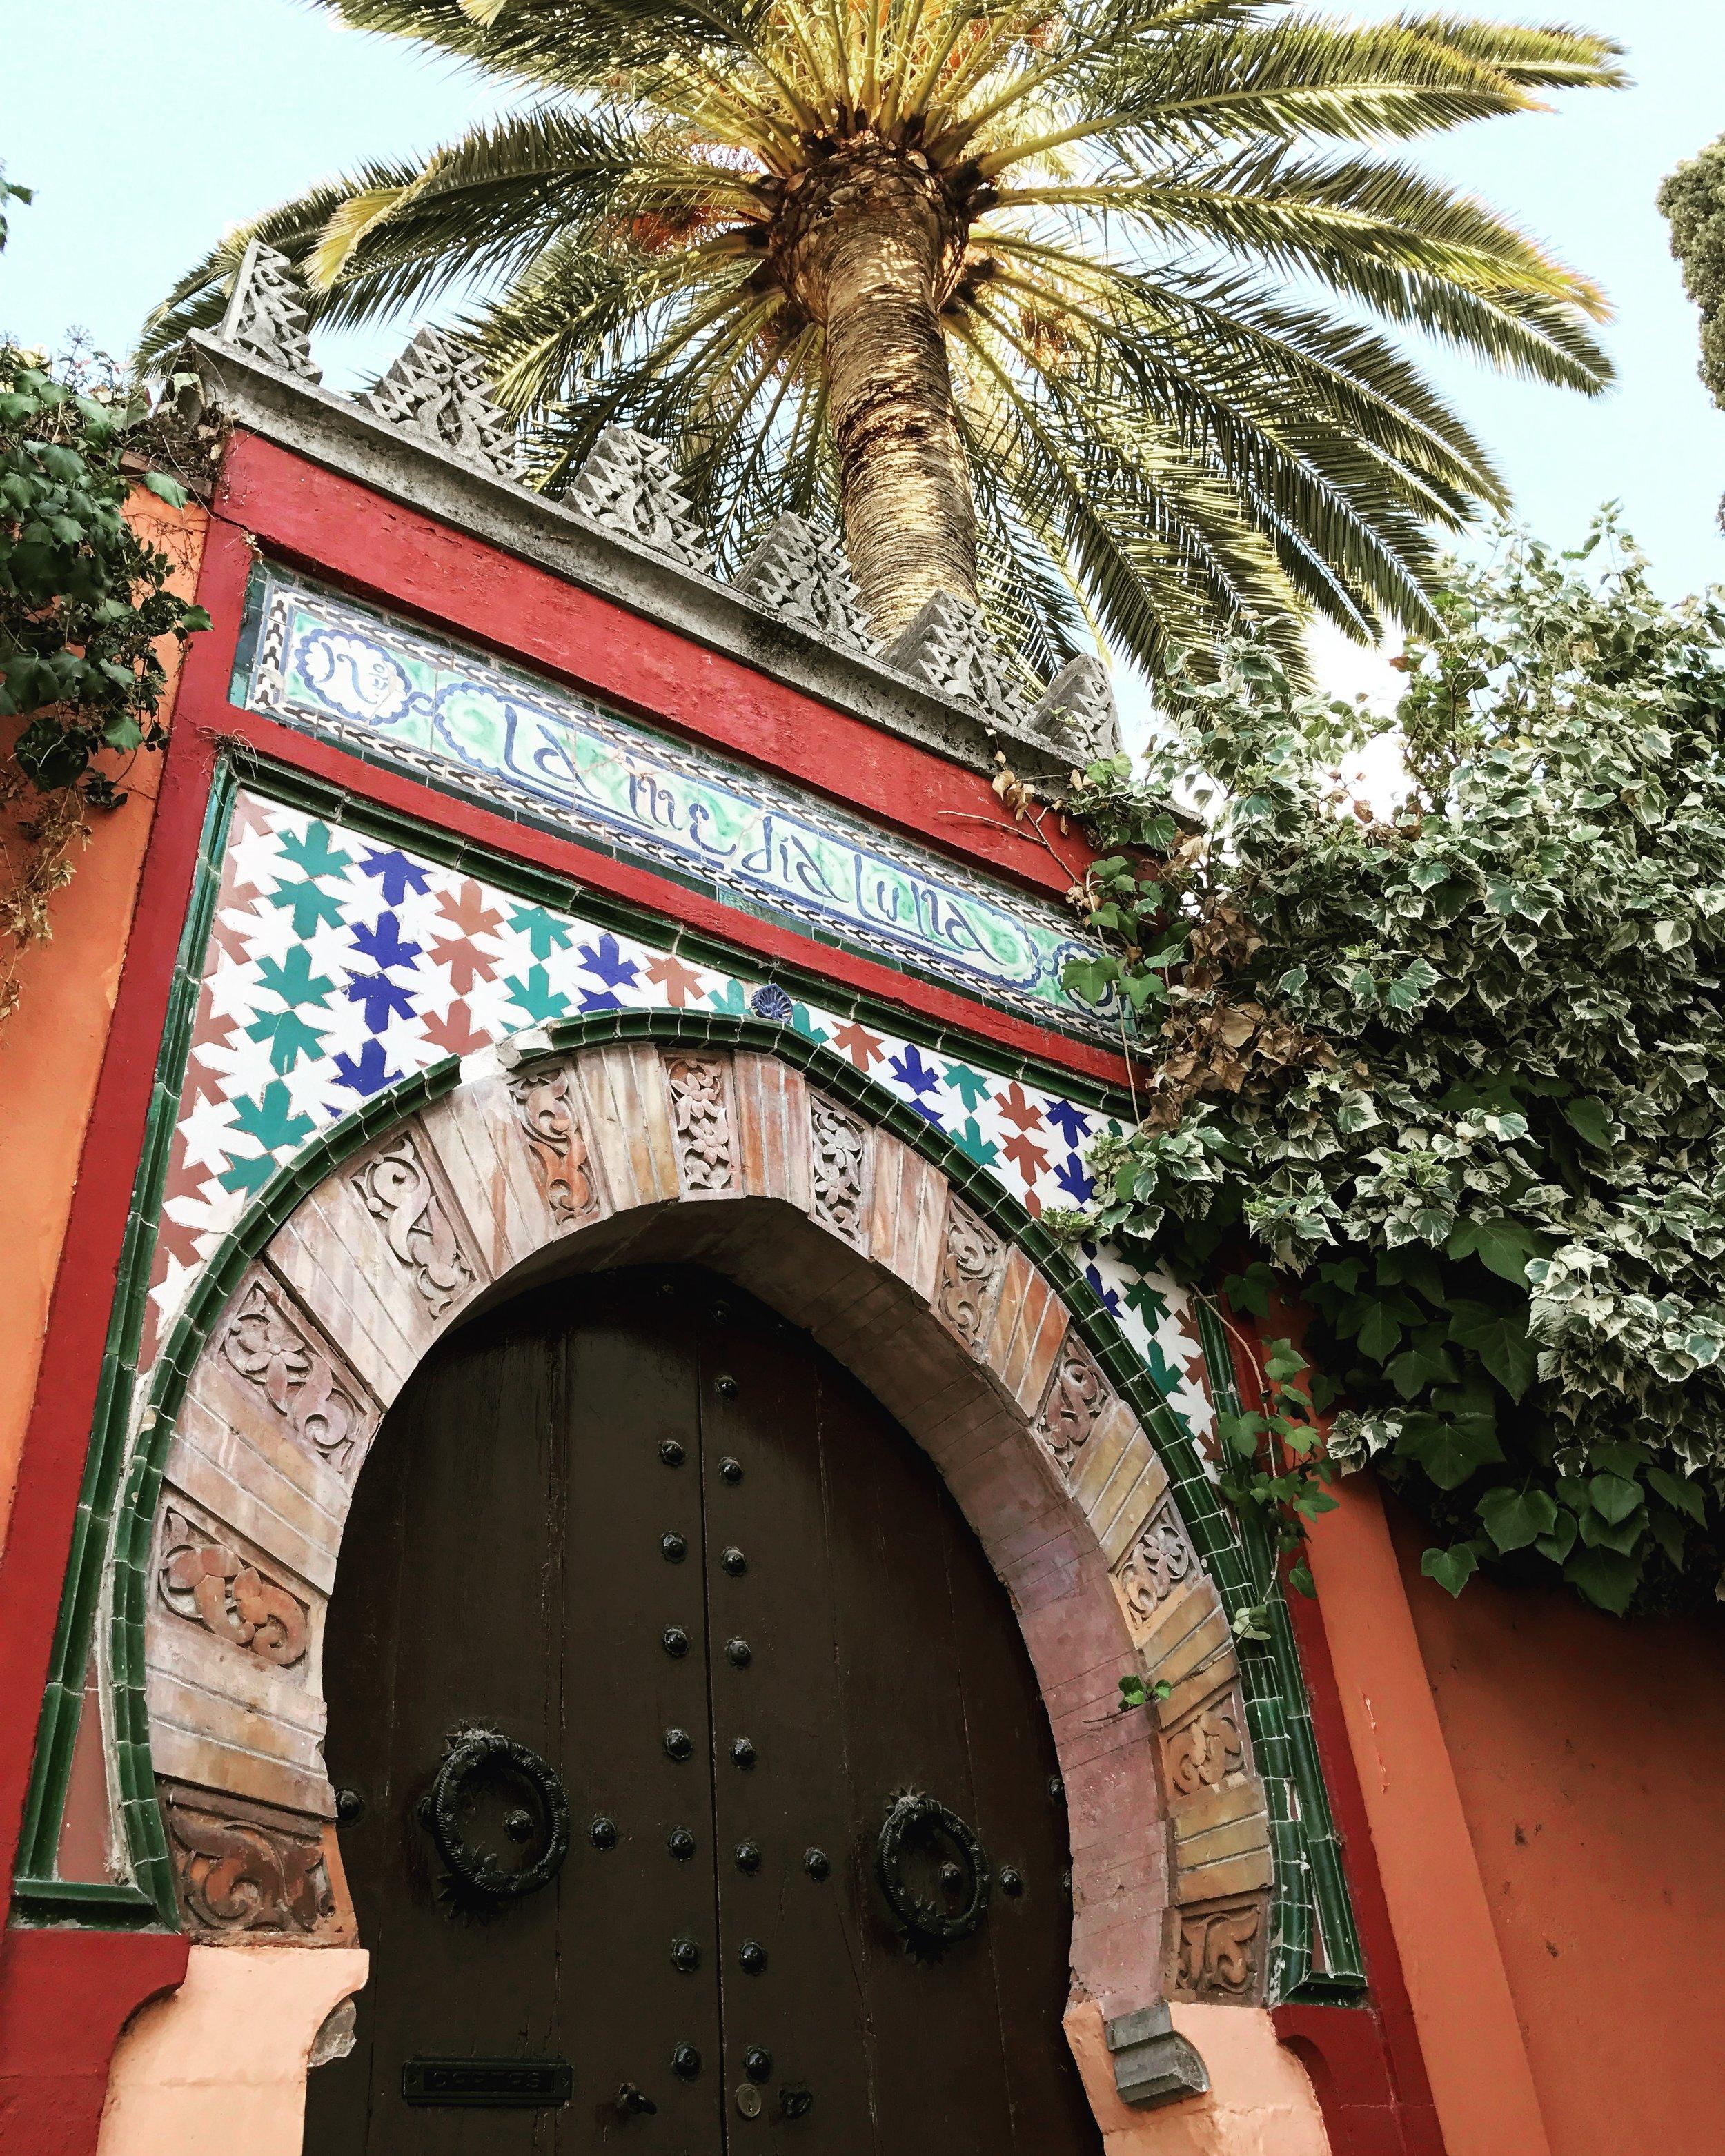 a doorway in the Albayzín neighborhood